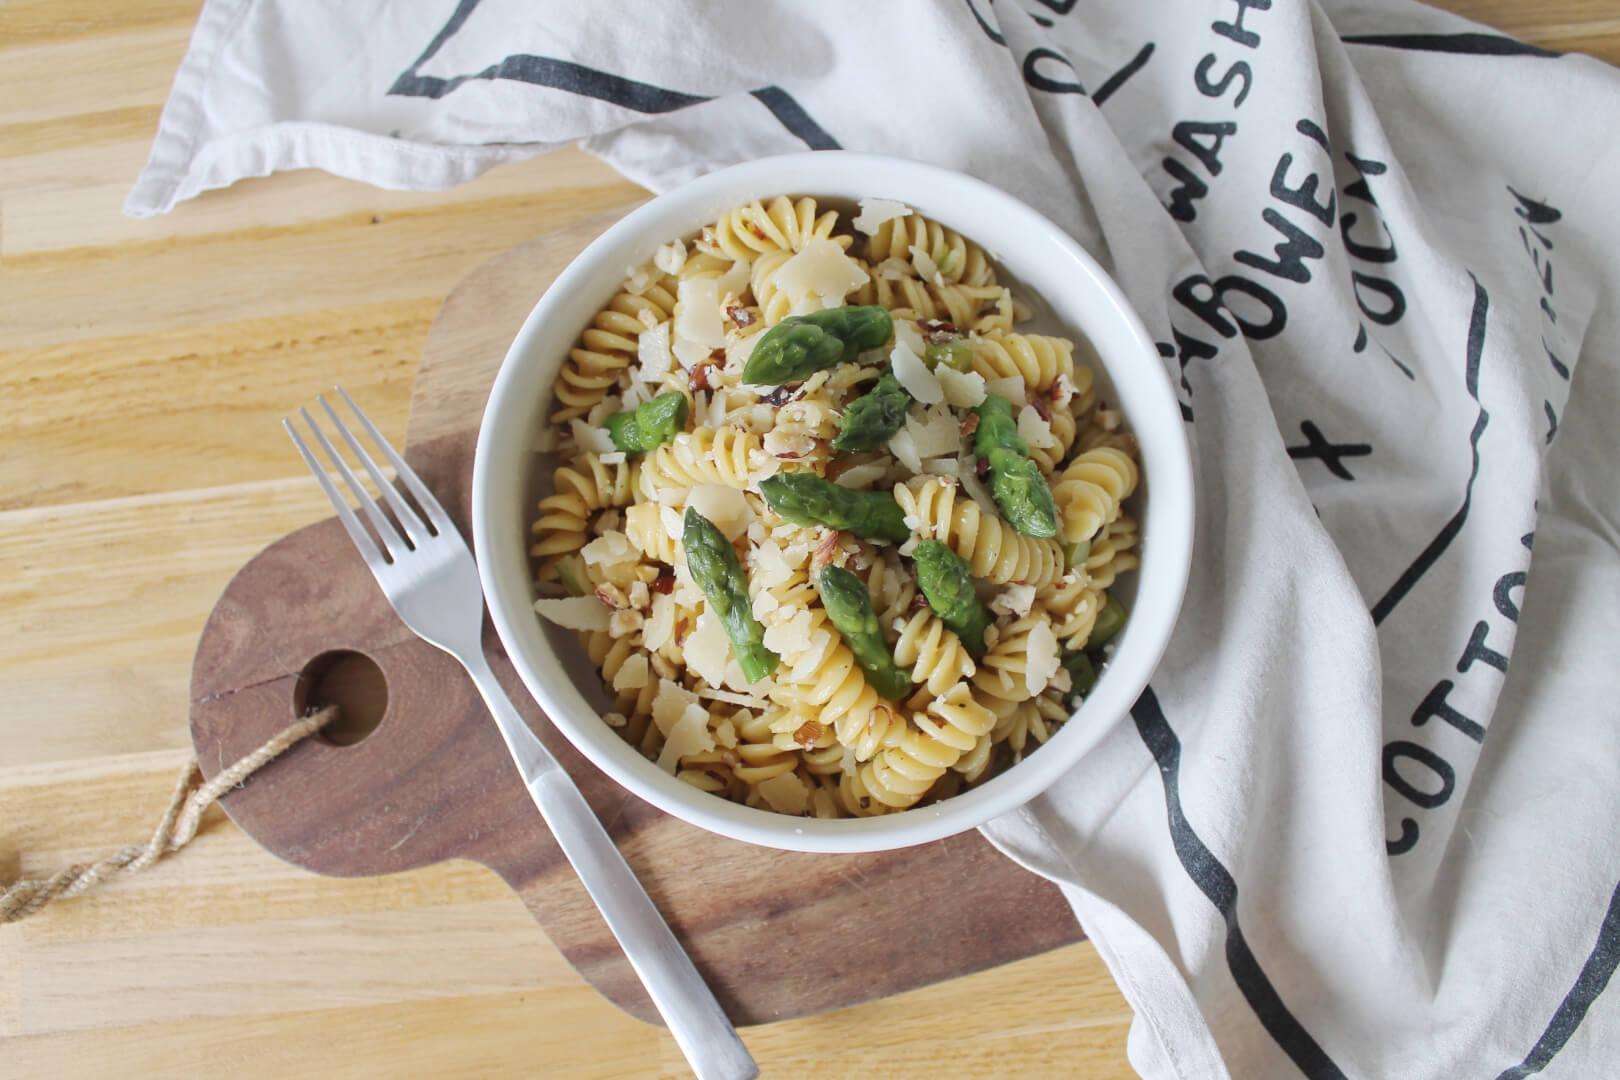 Pastasotto aux asperges vertes - Creatyve